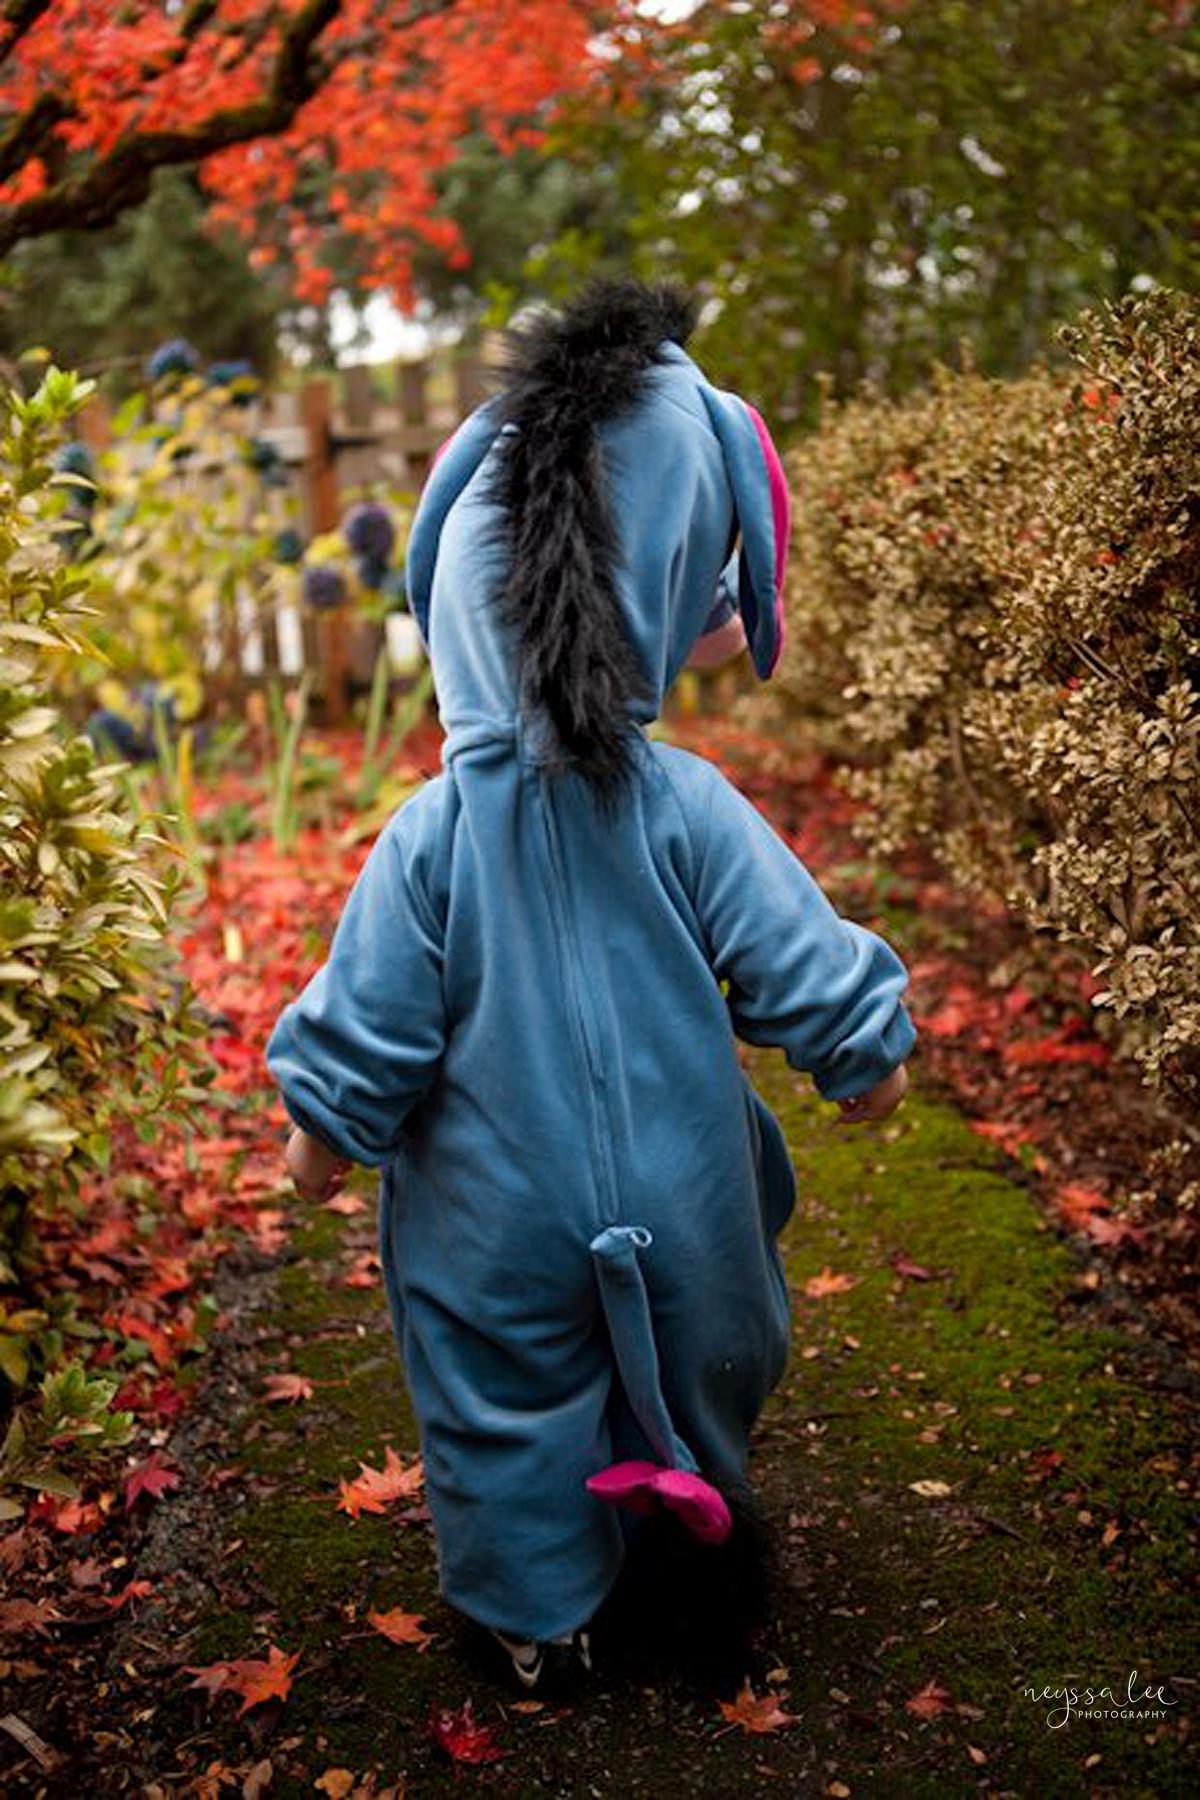 5 Tips for Magical Halloween Photos, Photo Tips, Neyssa Lee Photography, Eeyore Costume, Toddler walking in Halloween Costume